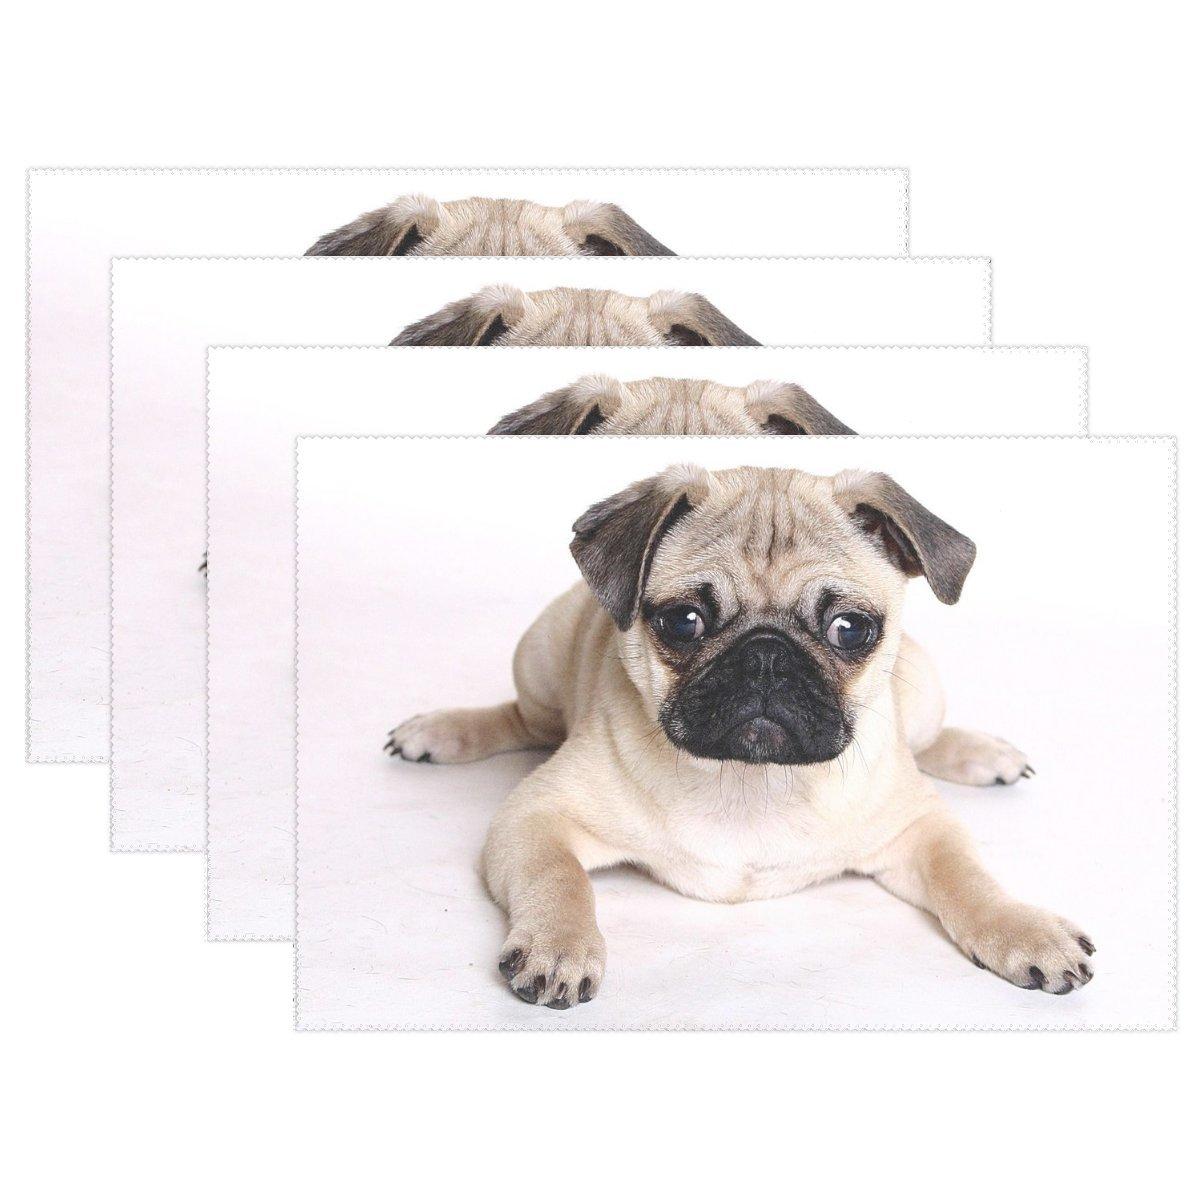 vnaskl動物犬パグふわふわSmall Puppyかわいいペットキュート耐熱テーブルPlacemats Set of 4 Stain Resistantテーブルマット洗濯可能食べマットホームディナー装飾   B07D8J3VMC